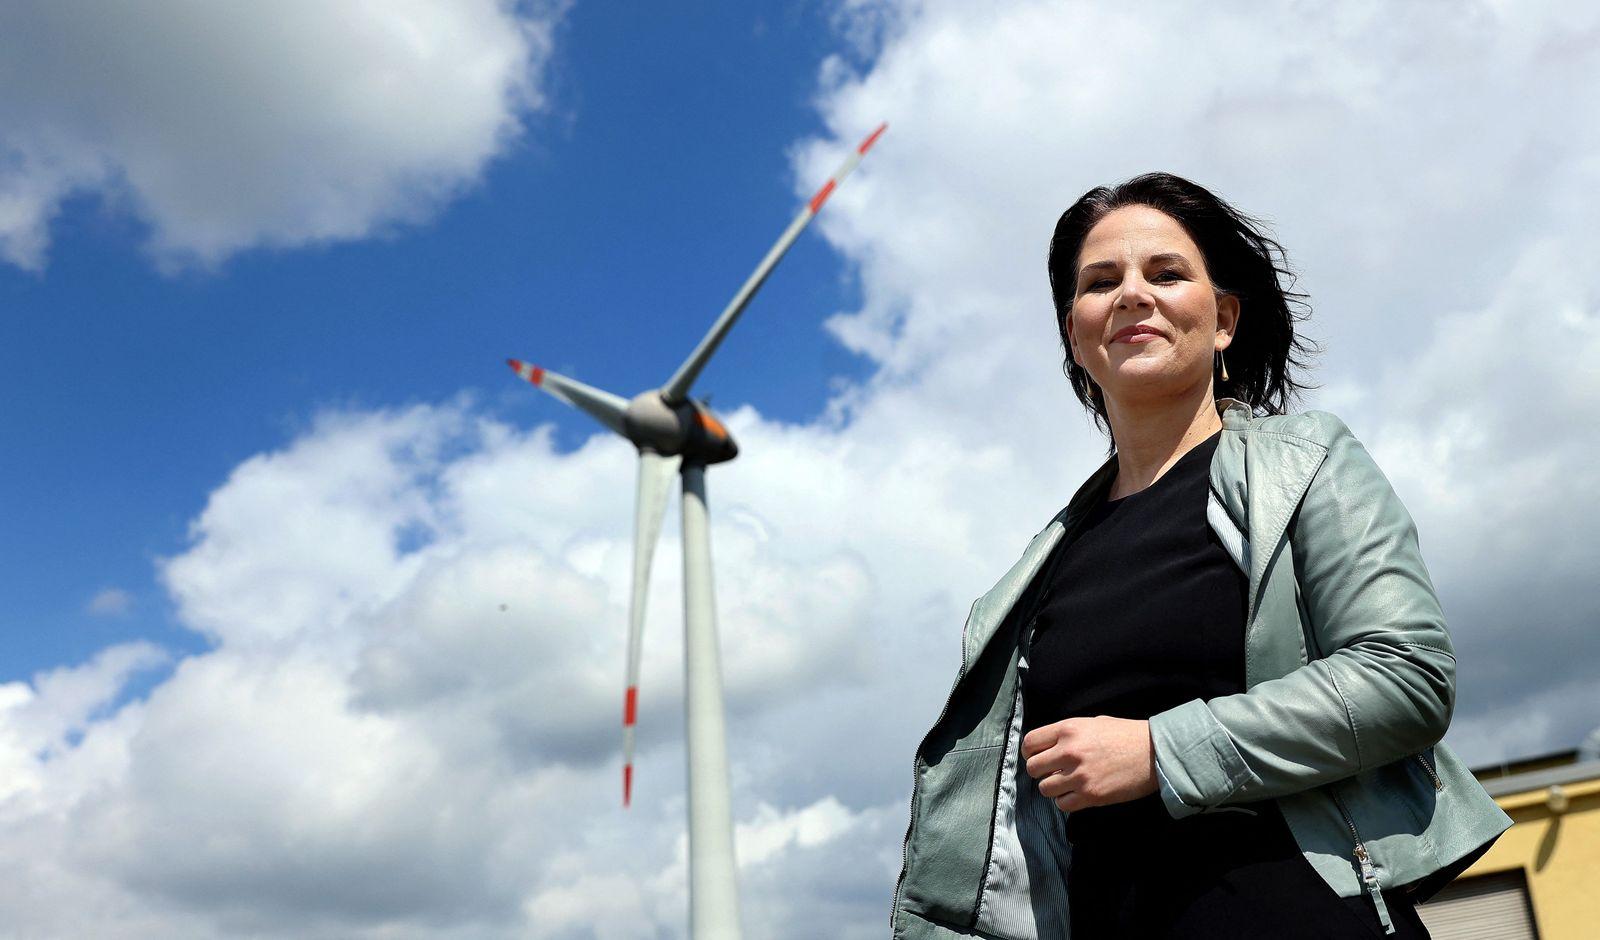 GERMANY-POLITICS-PARTIES-GREENS-ENERCON